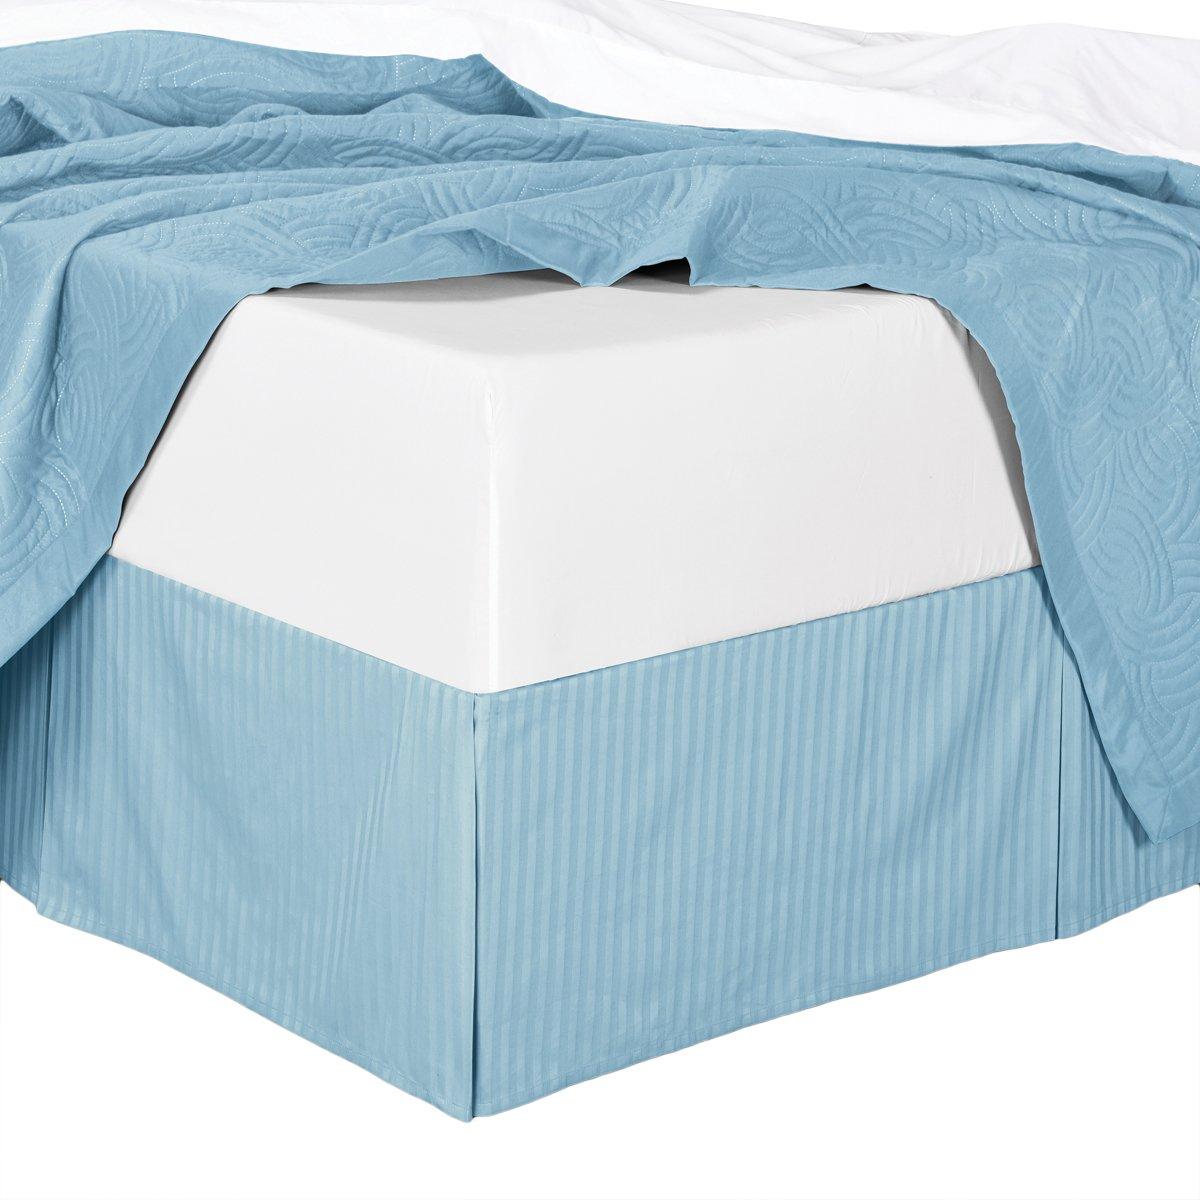 wrinkle-freeストライプアイボリーKingサイズプリーツ仕立て14インチdrop- 95 gsm、100 %マイクロファイバーベッドスカート キング ブルー B075XJ9X56 ブルー